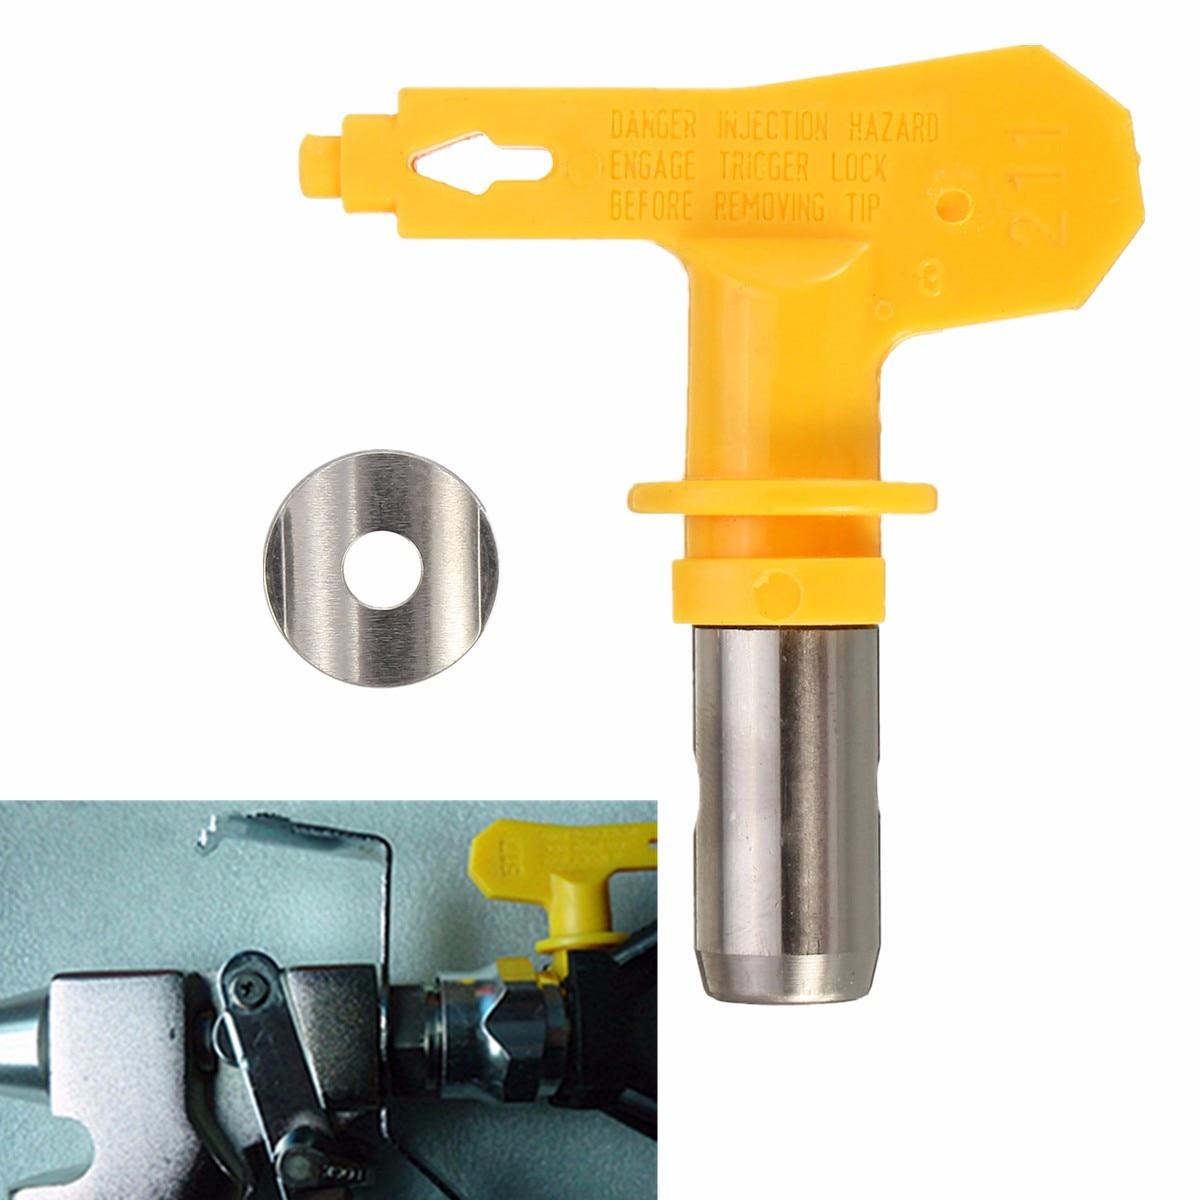 Yellow 2 Series 213/215/217/221/211 Airless Spray Tip Sprayer Nozzles For Airless Spray Paint Sprayer